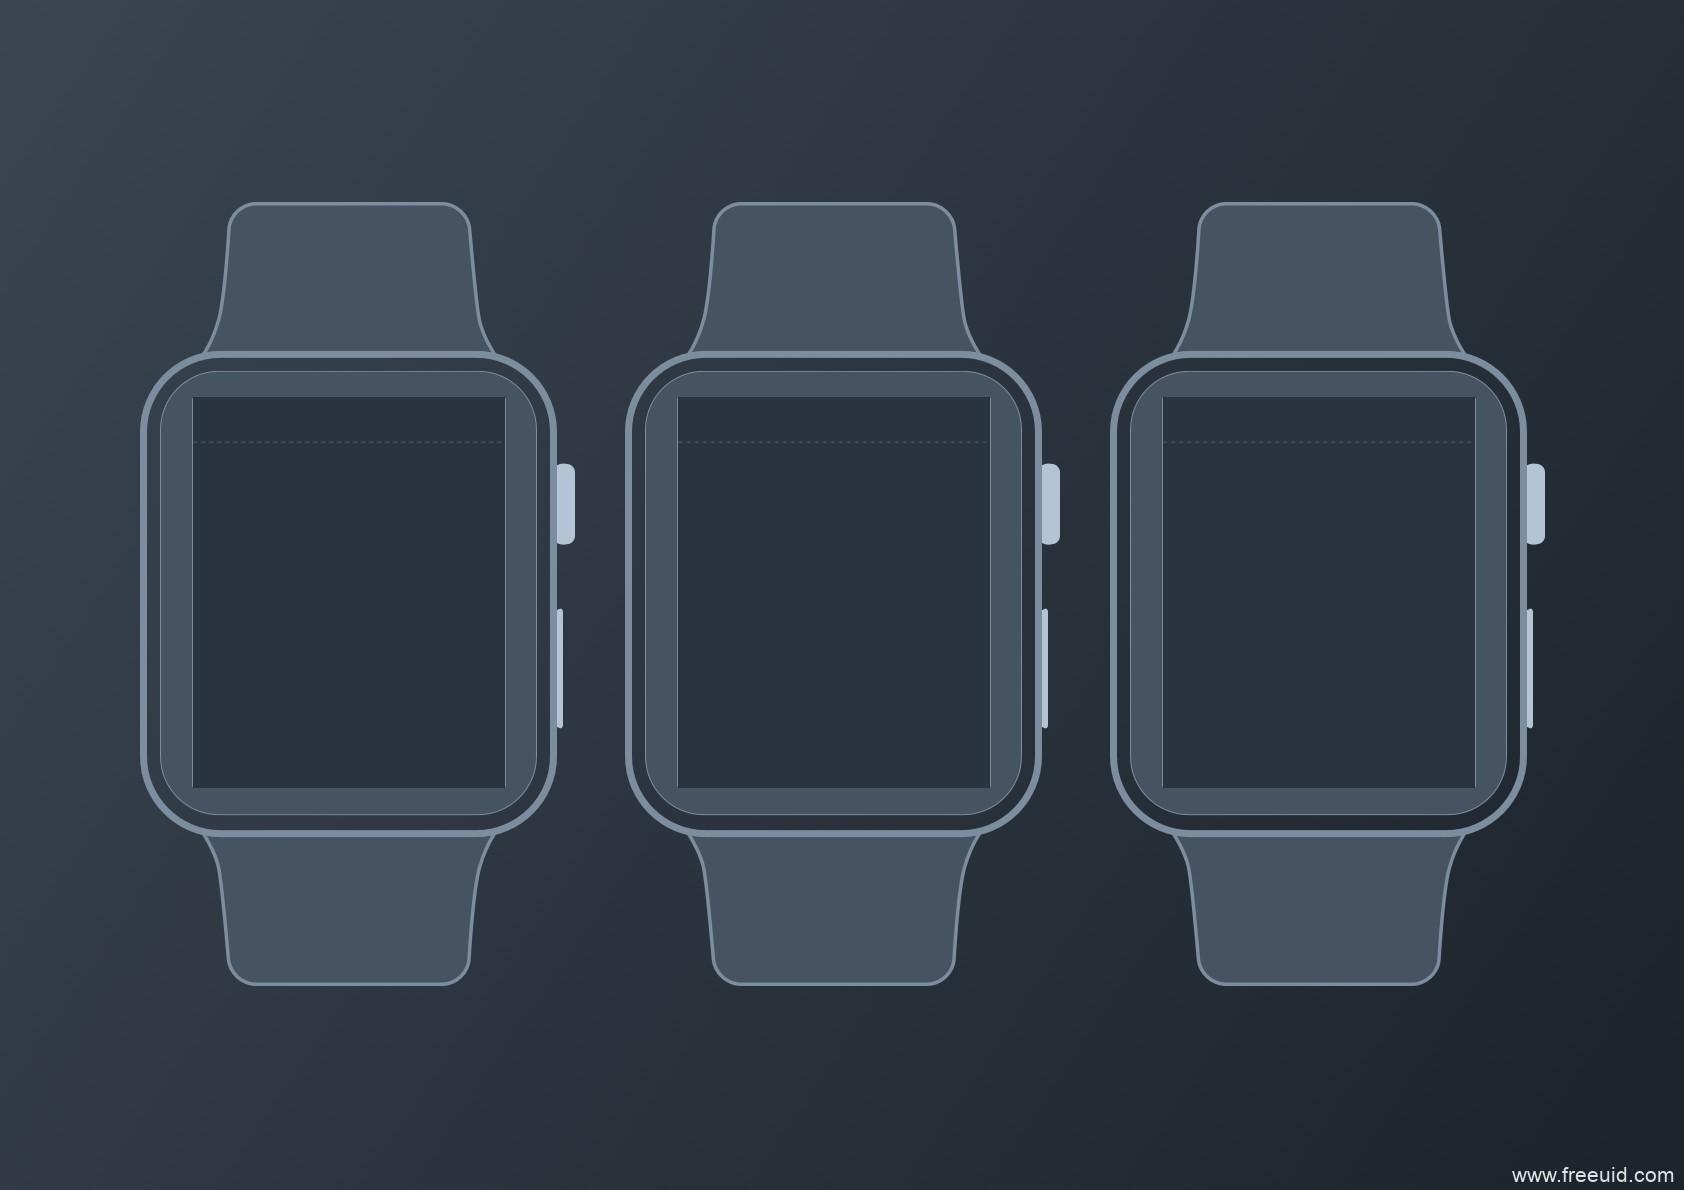 UI全平台线框图模板源文件下载,sketch源文件下载